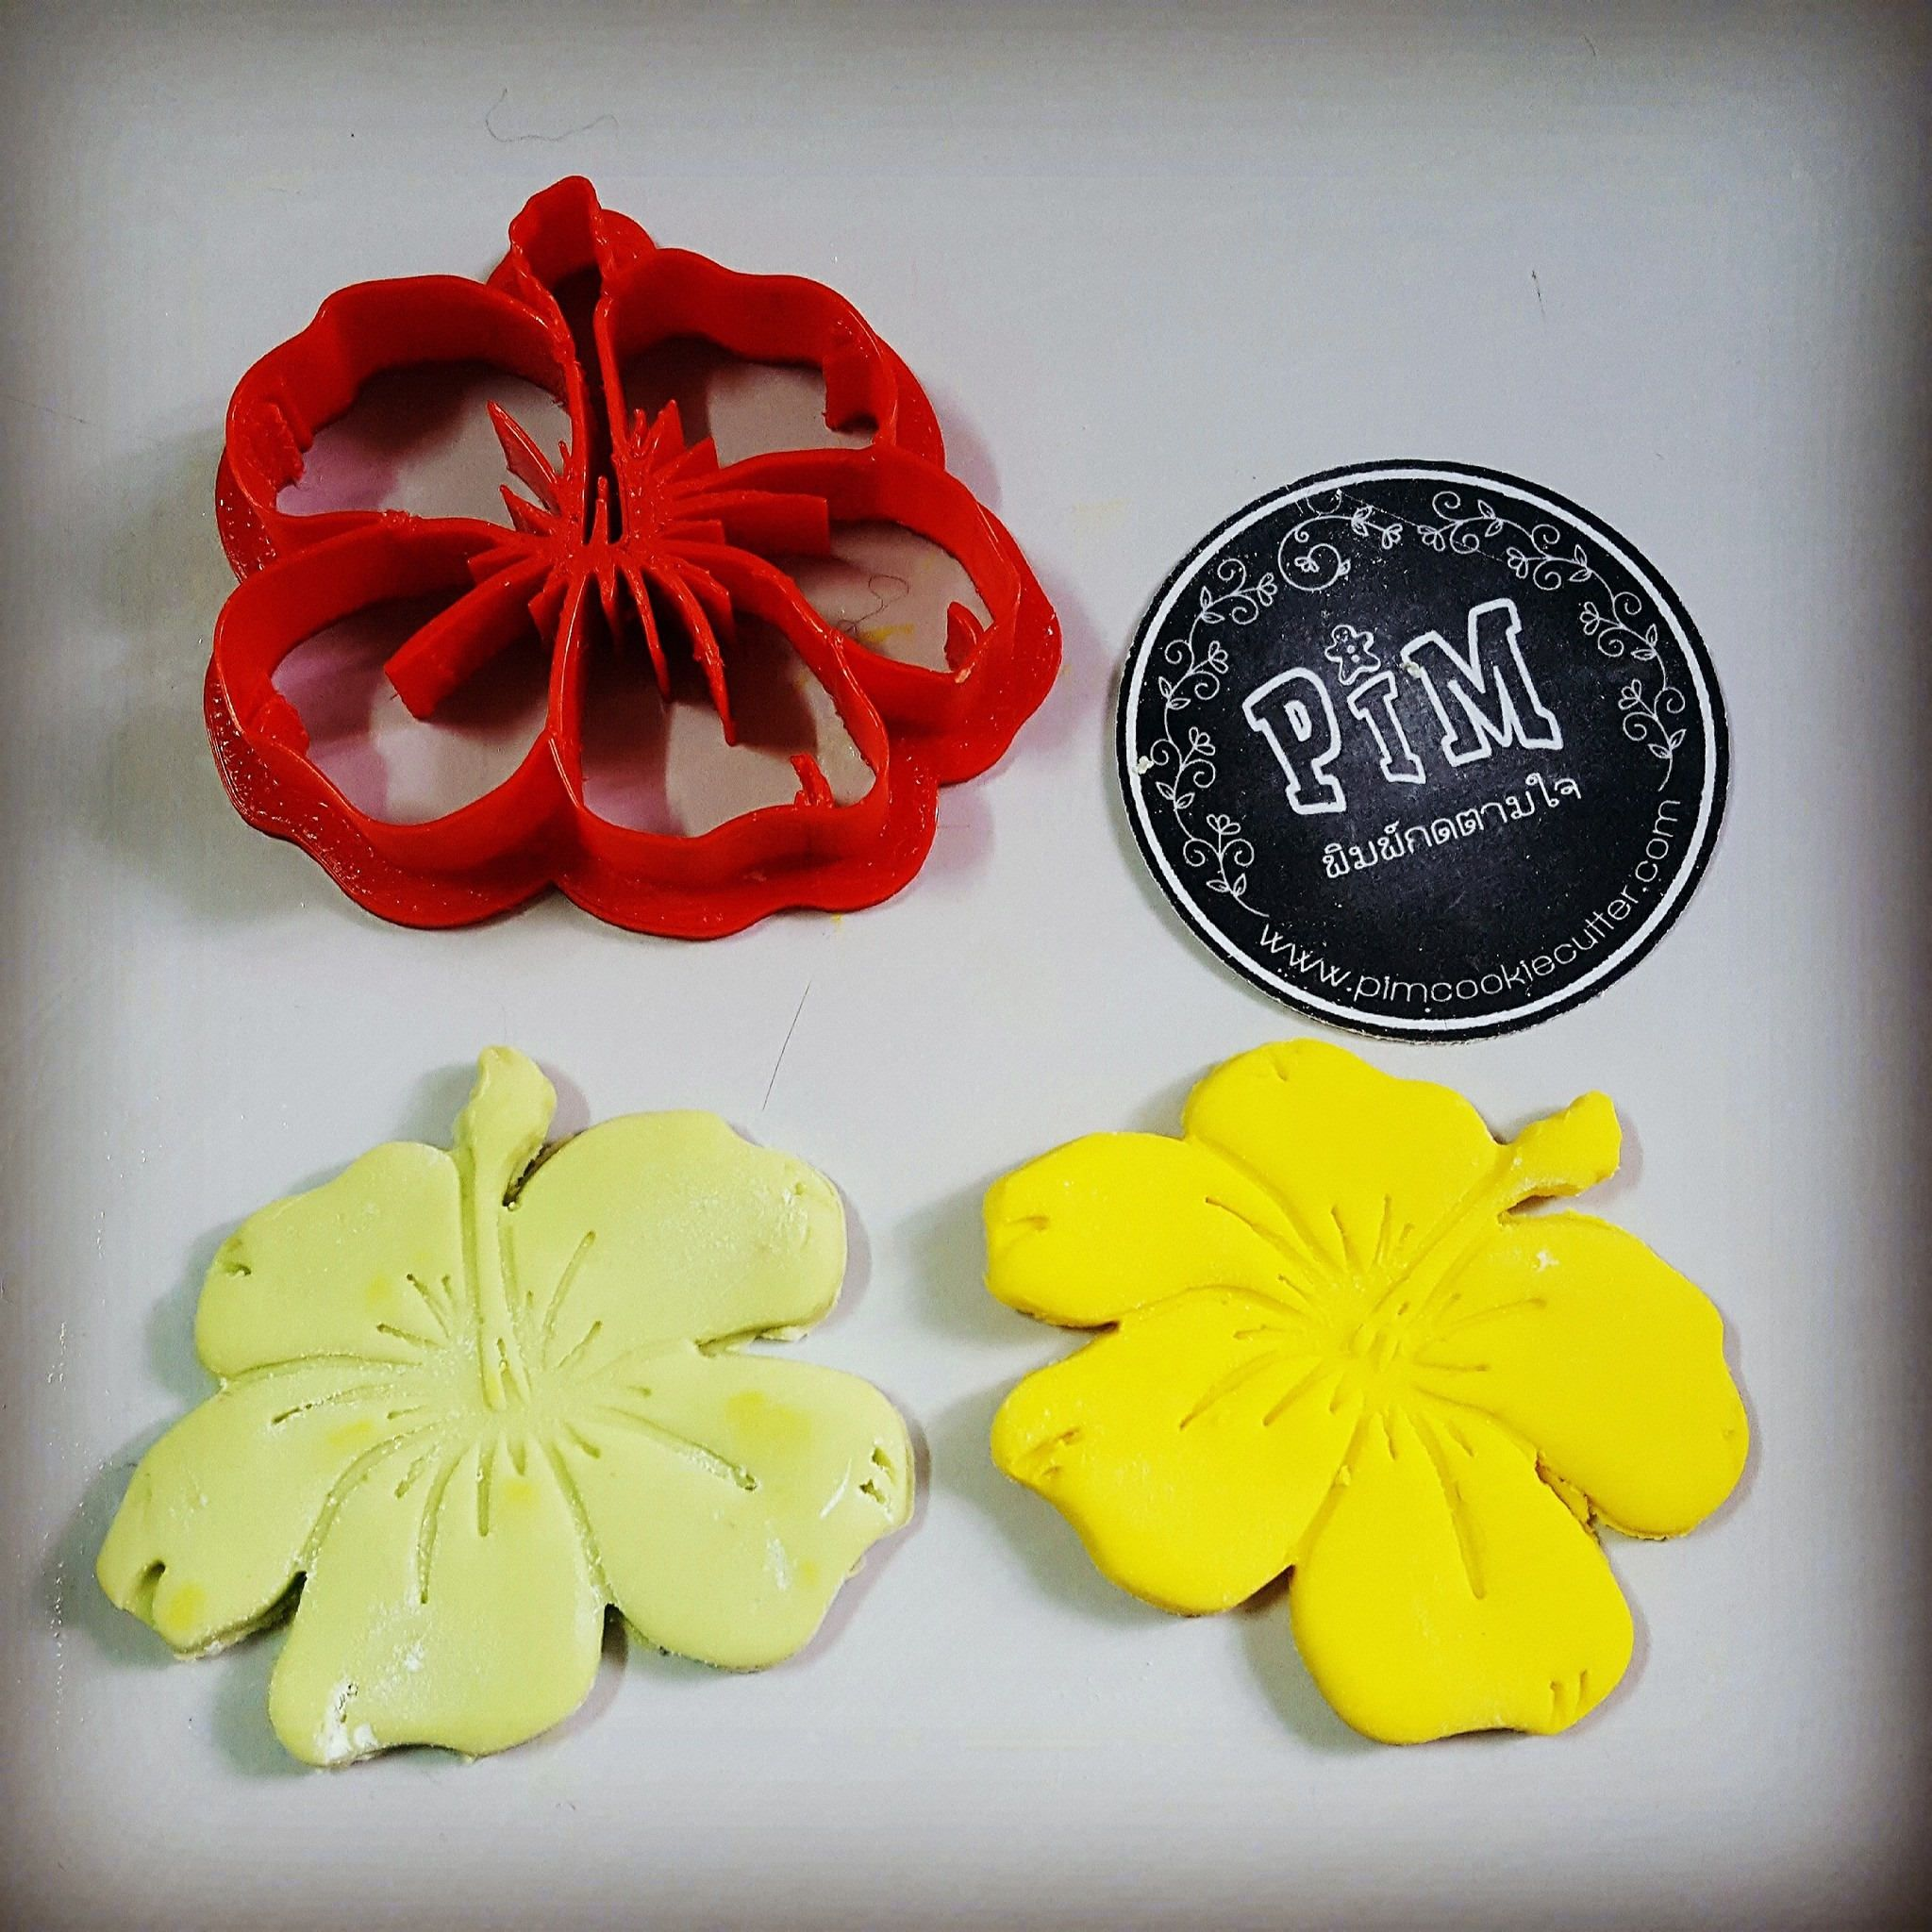 Beautiful hibiscus flower cookie cutter cookie cutter pinterest beautiful hibiscus flower cookie cutter by pimcookiecutter on etsy izmirmasajfo